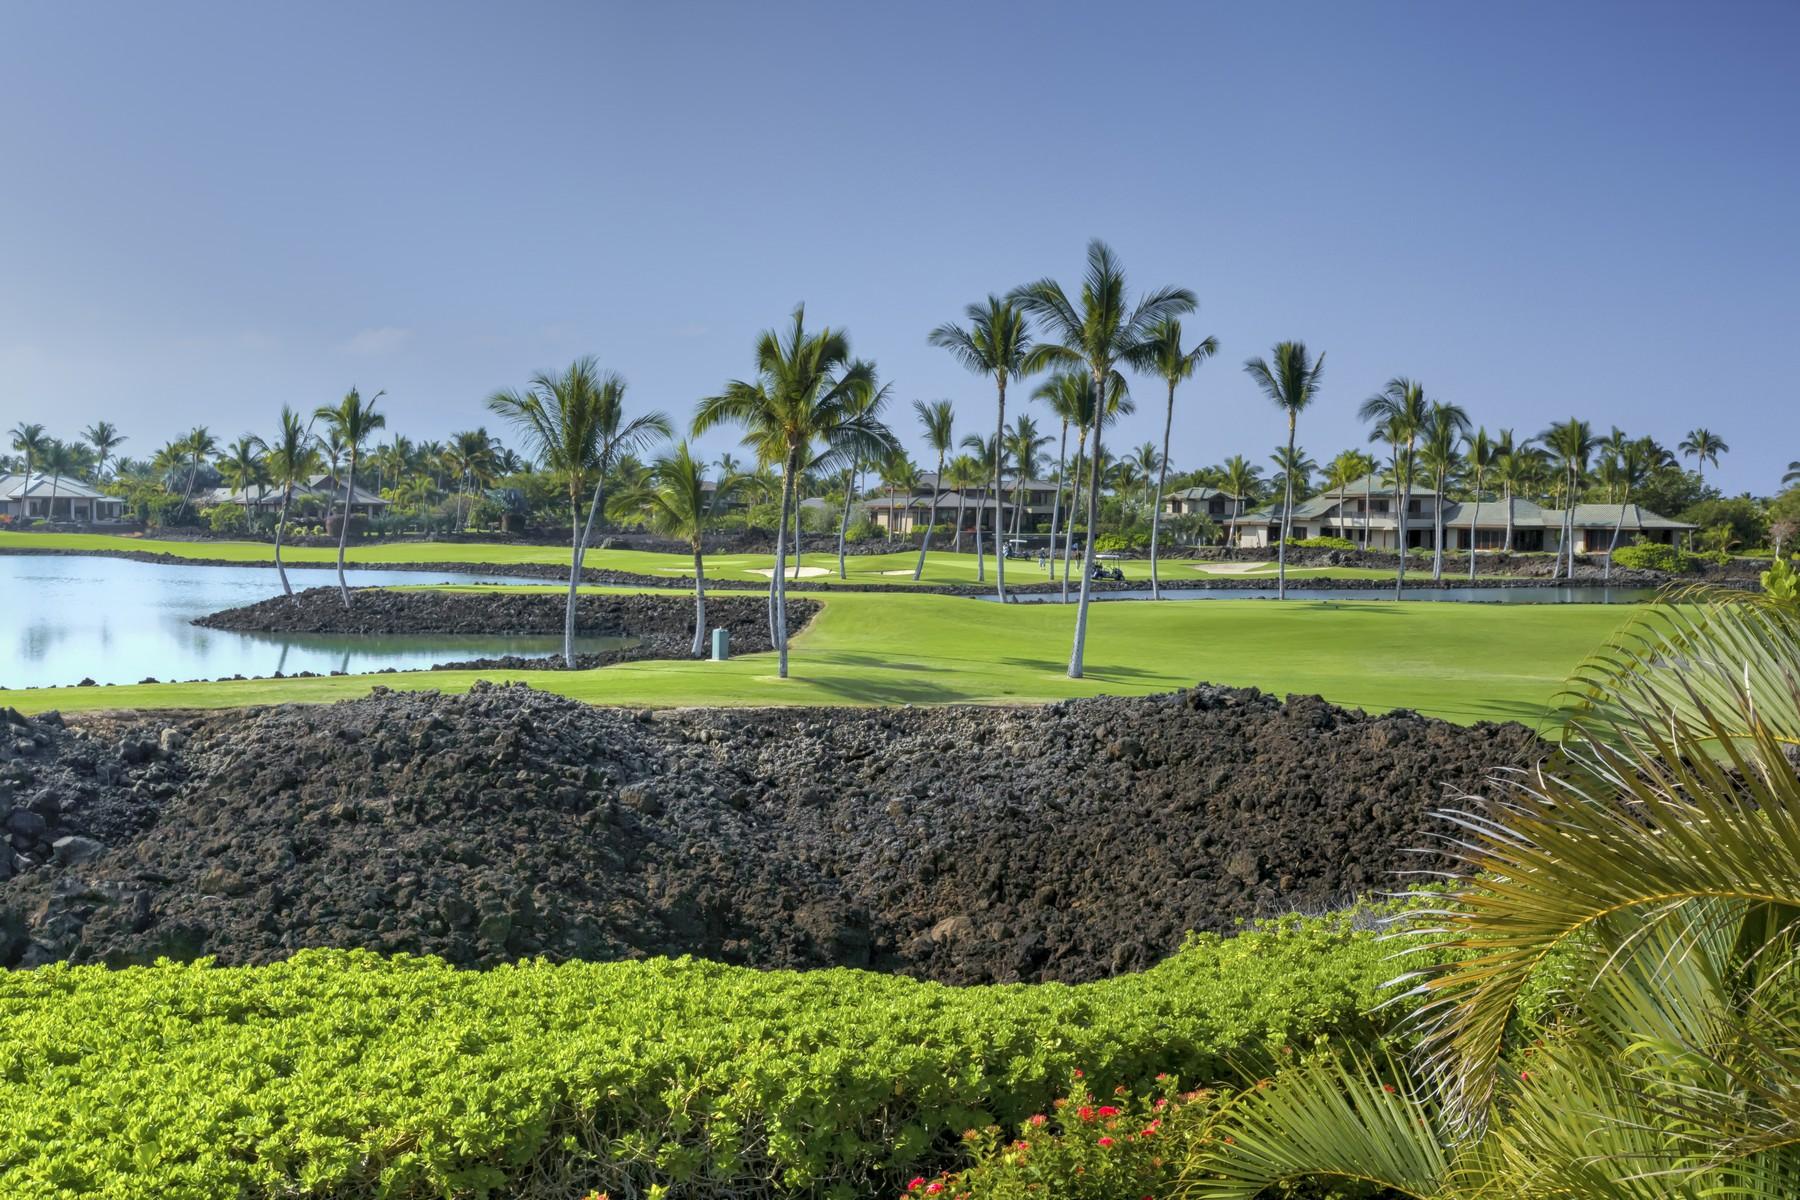 Condomínio para Venda às Mauna Lani Point 68-1050 Mauna Lani Point Dr. #H205 Kamuela, Havaí, 96743 Estados Unidos